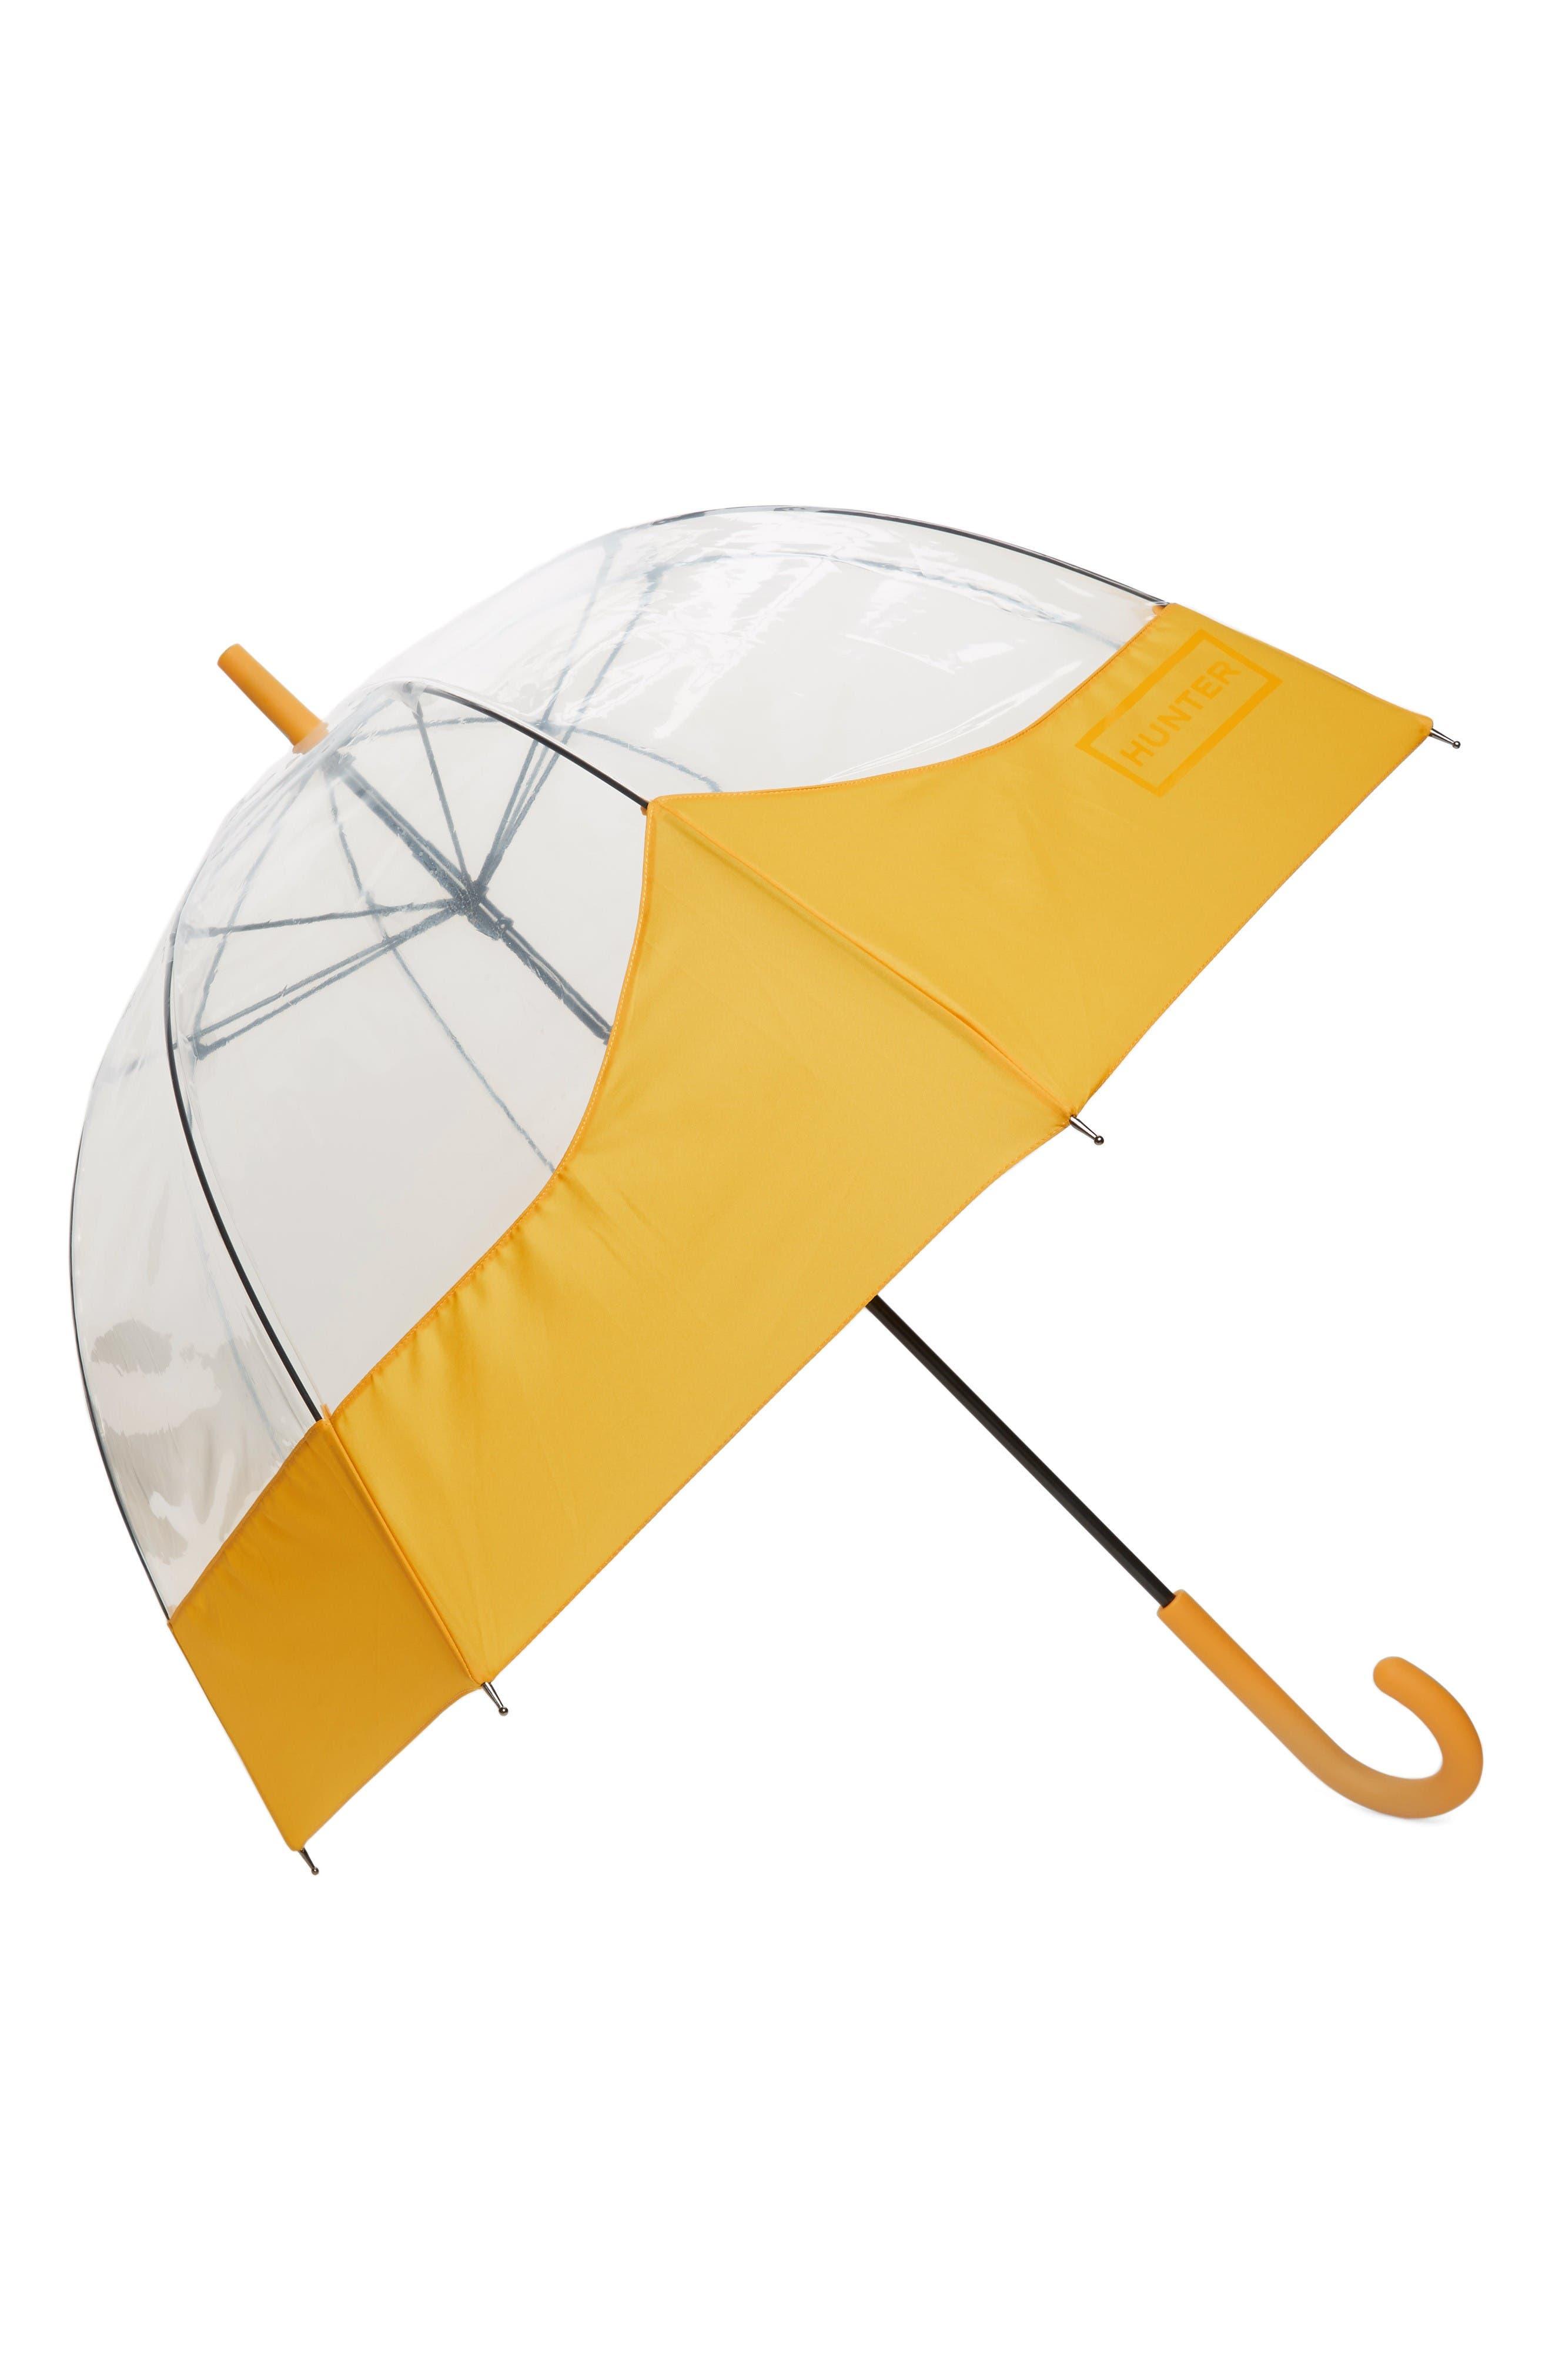 Alternate Image 1 Selected - Hunter 'Moustache' Bubble Umbrella